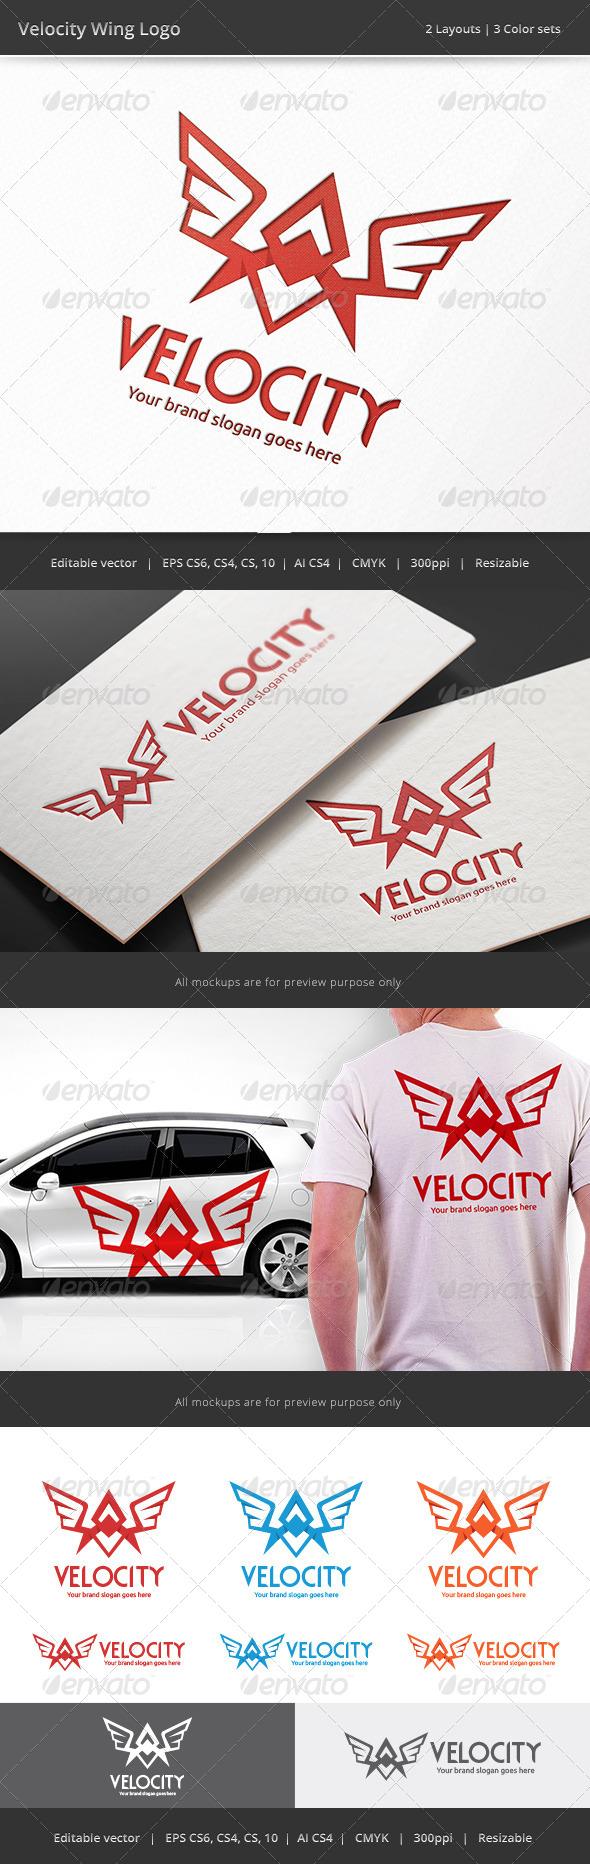 GraphicRiver Velocity Wing Logo 8731527